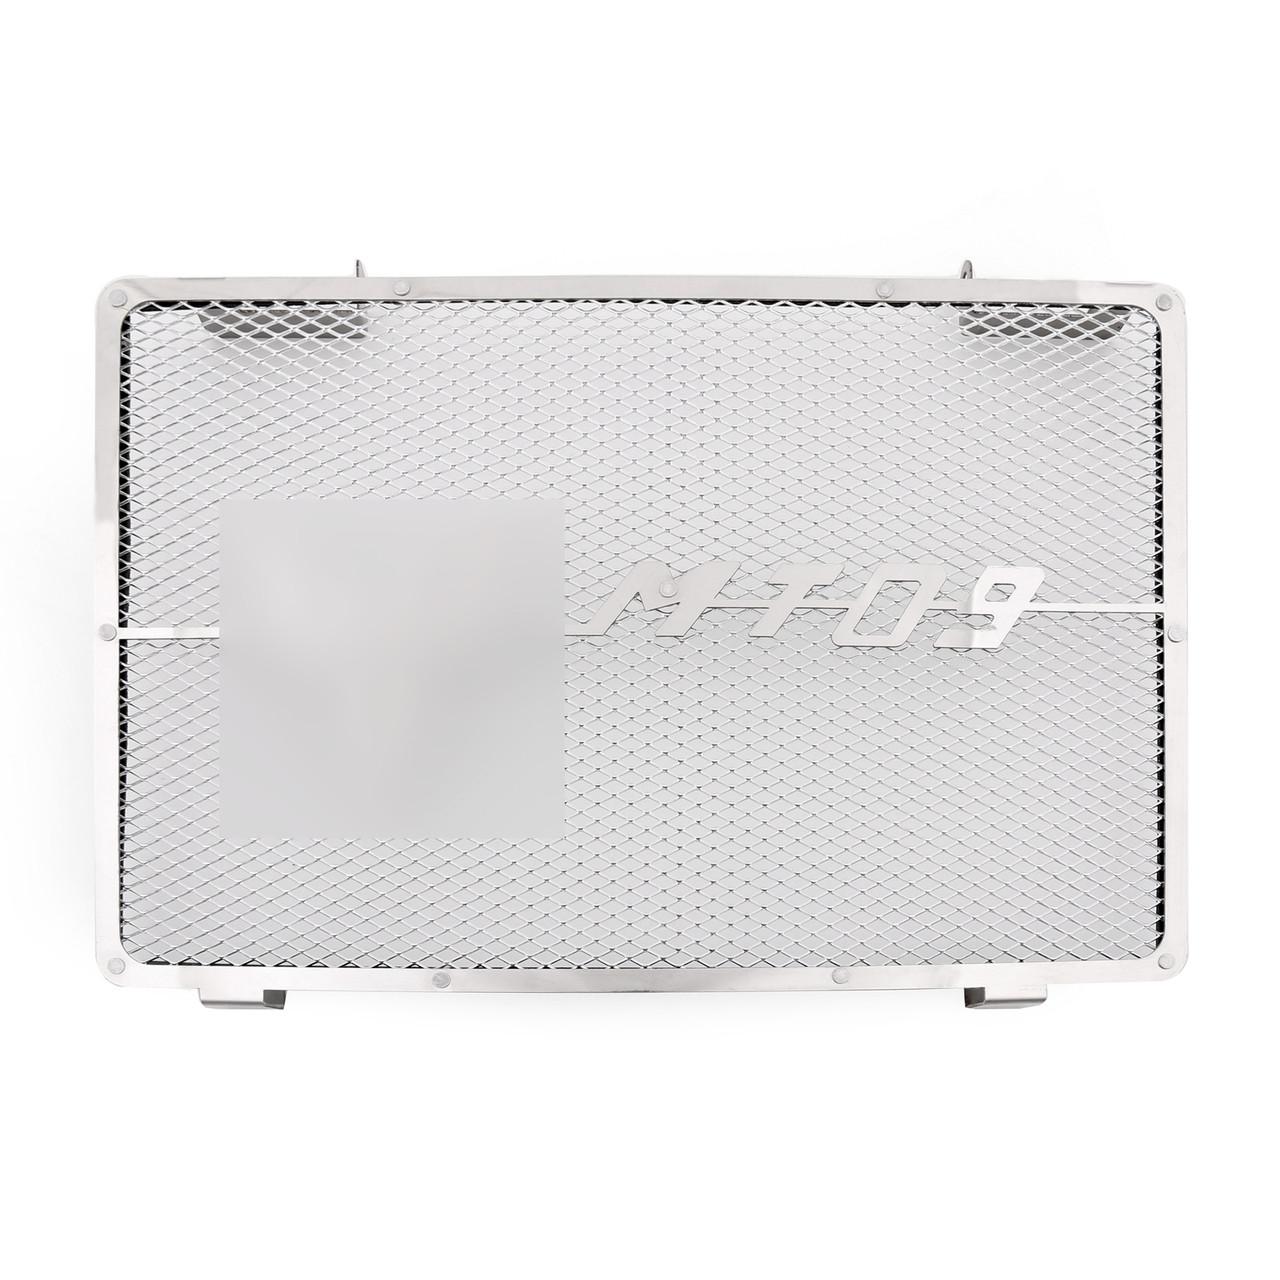 http://www.madhornets.store/AMZ/MotoPart/Radiator%20Guard/Guard-310/Guard-310-Silver-1.jpg